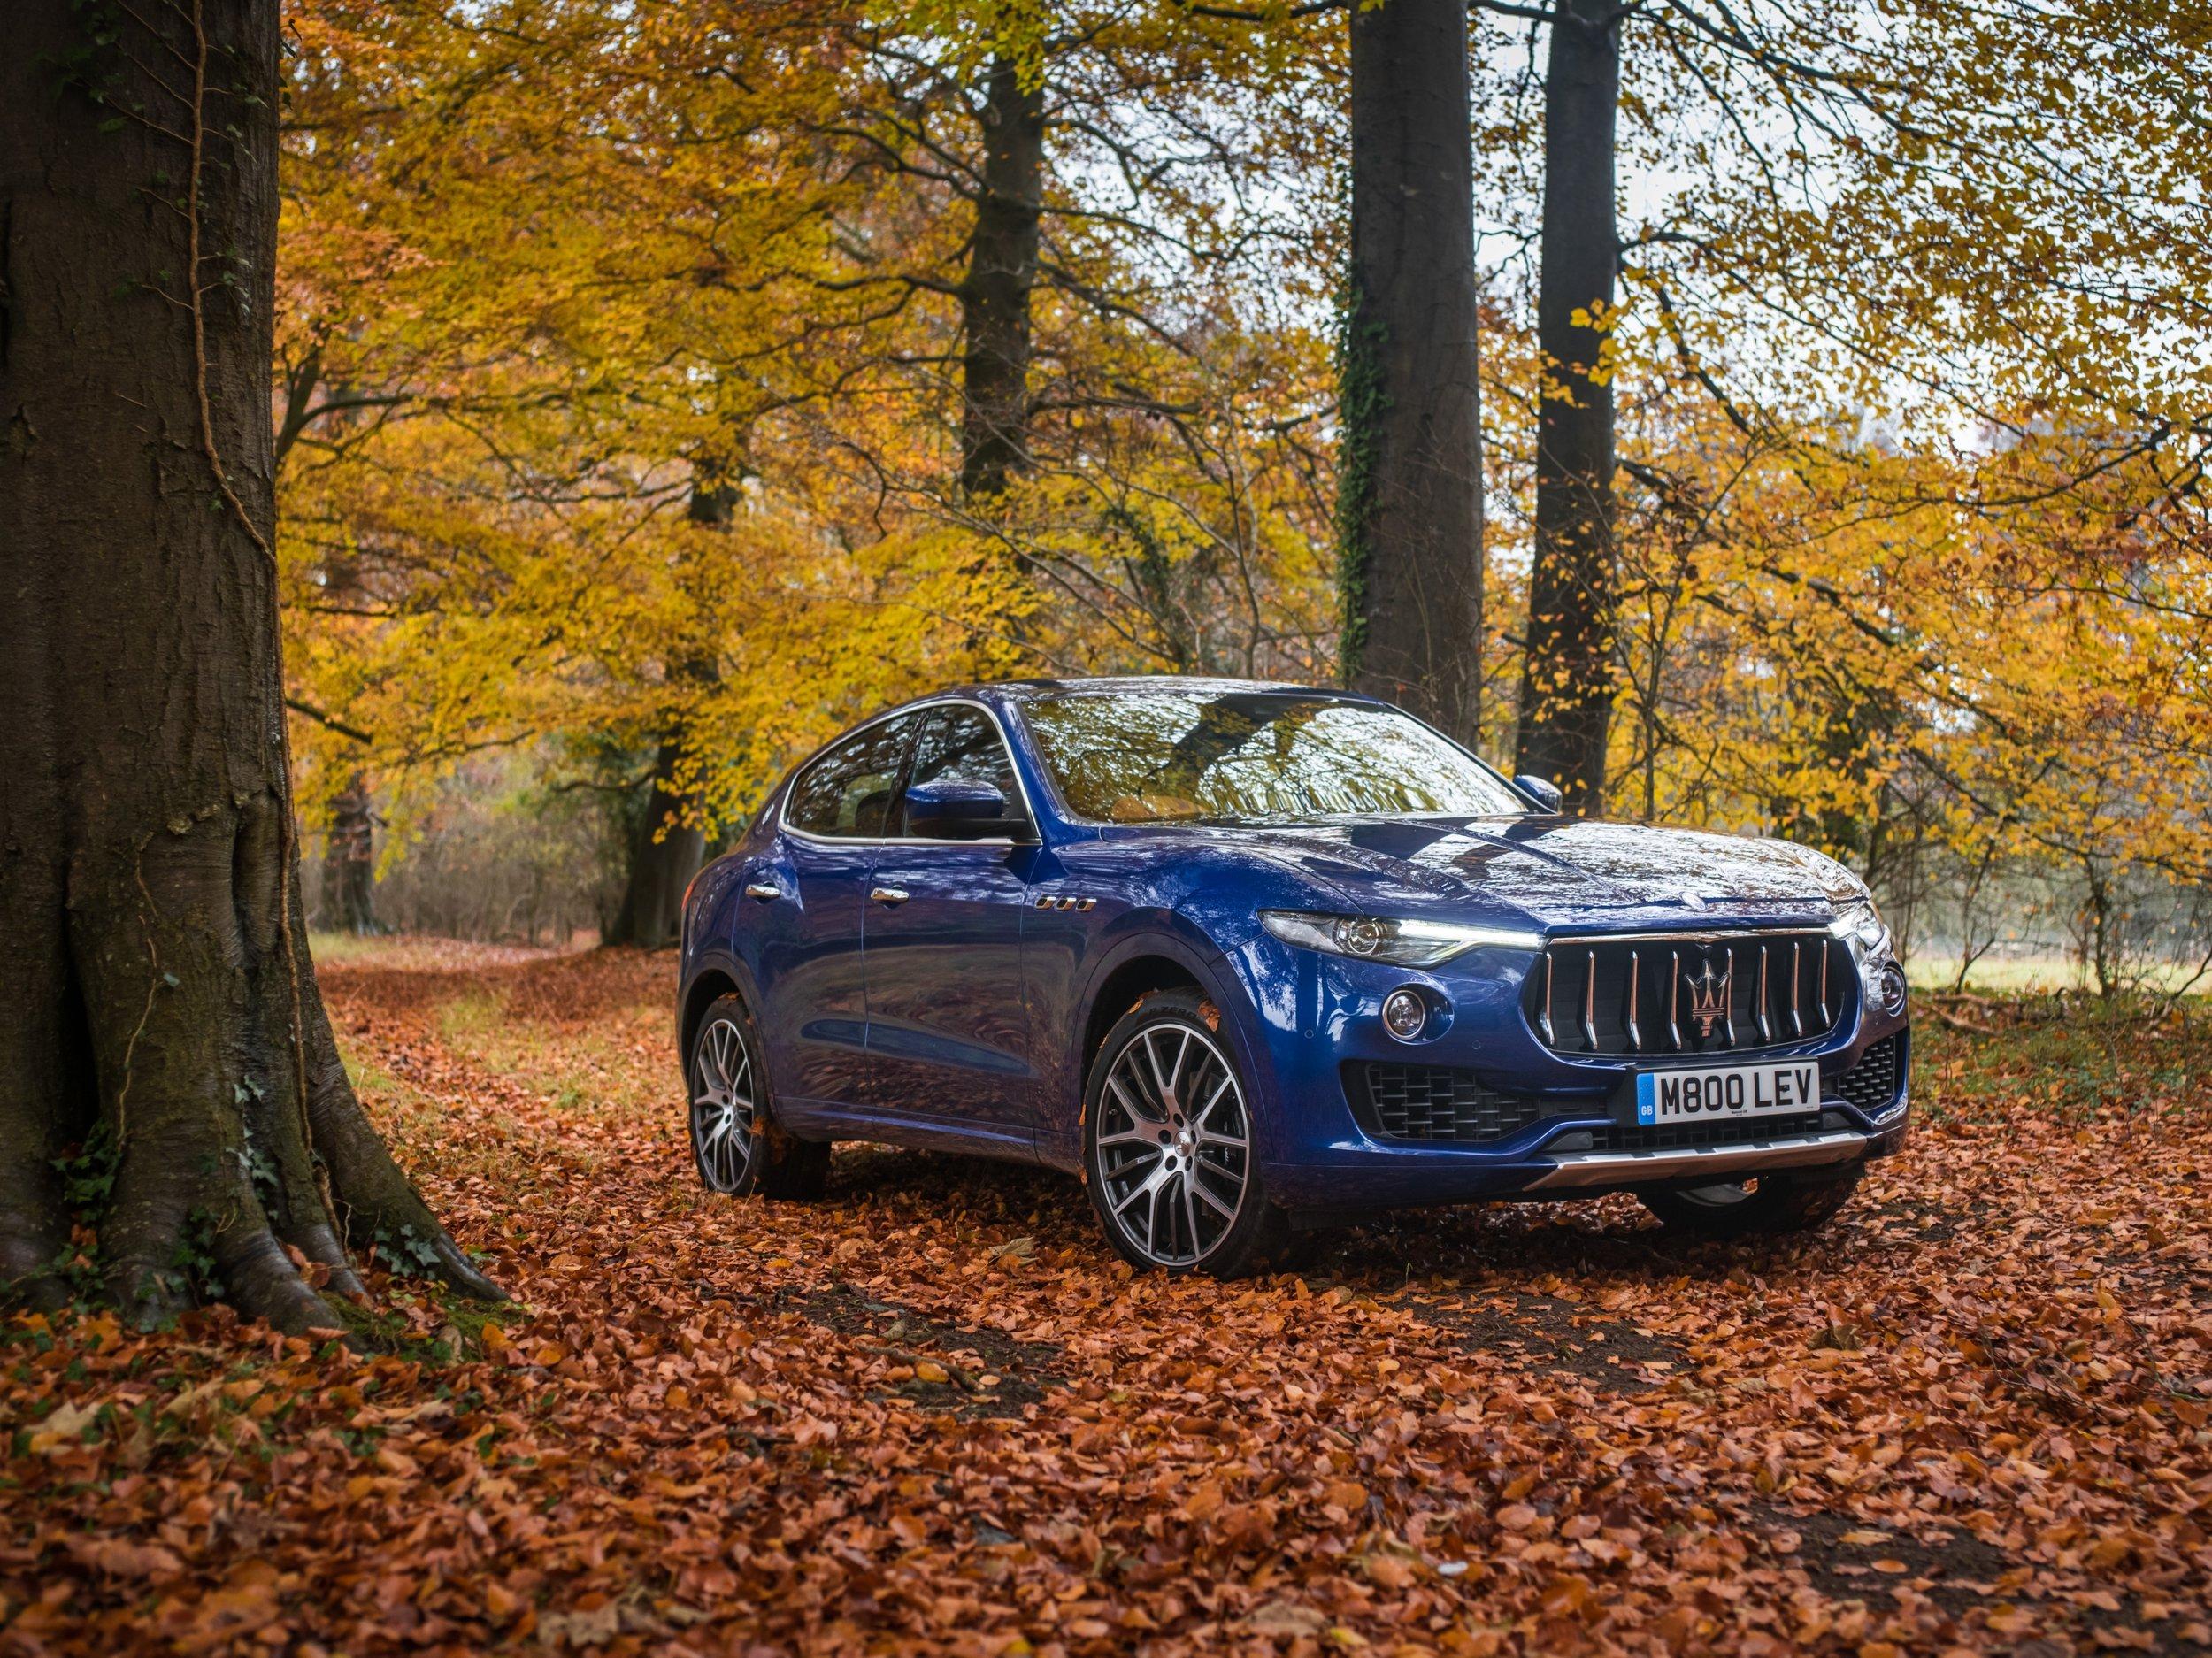 2017 Maserati Levante, Photo courtesy of Fiat Chrysler Automobiles